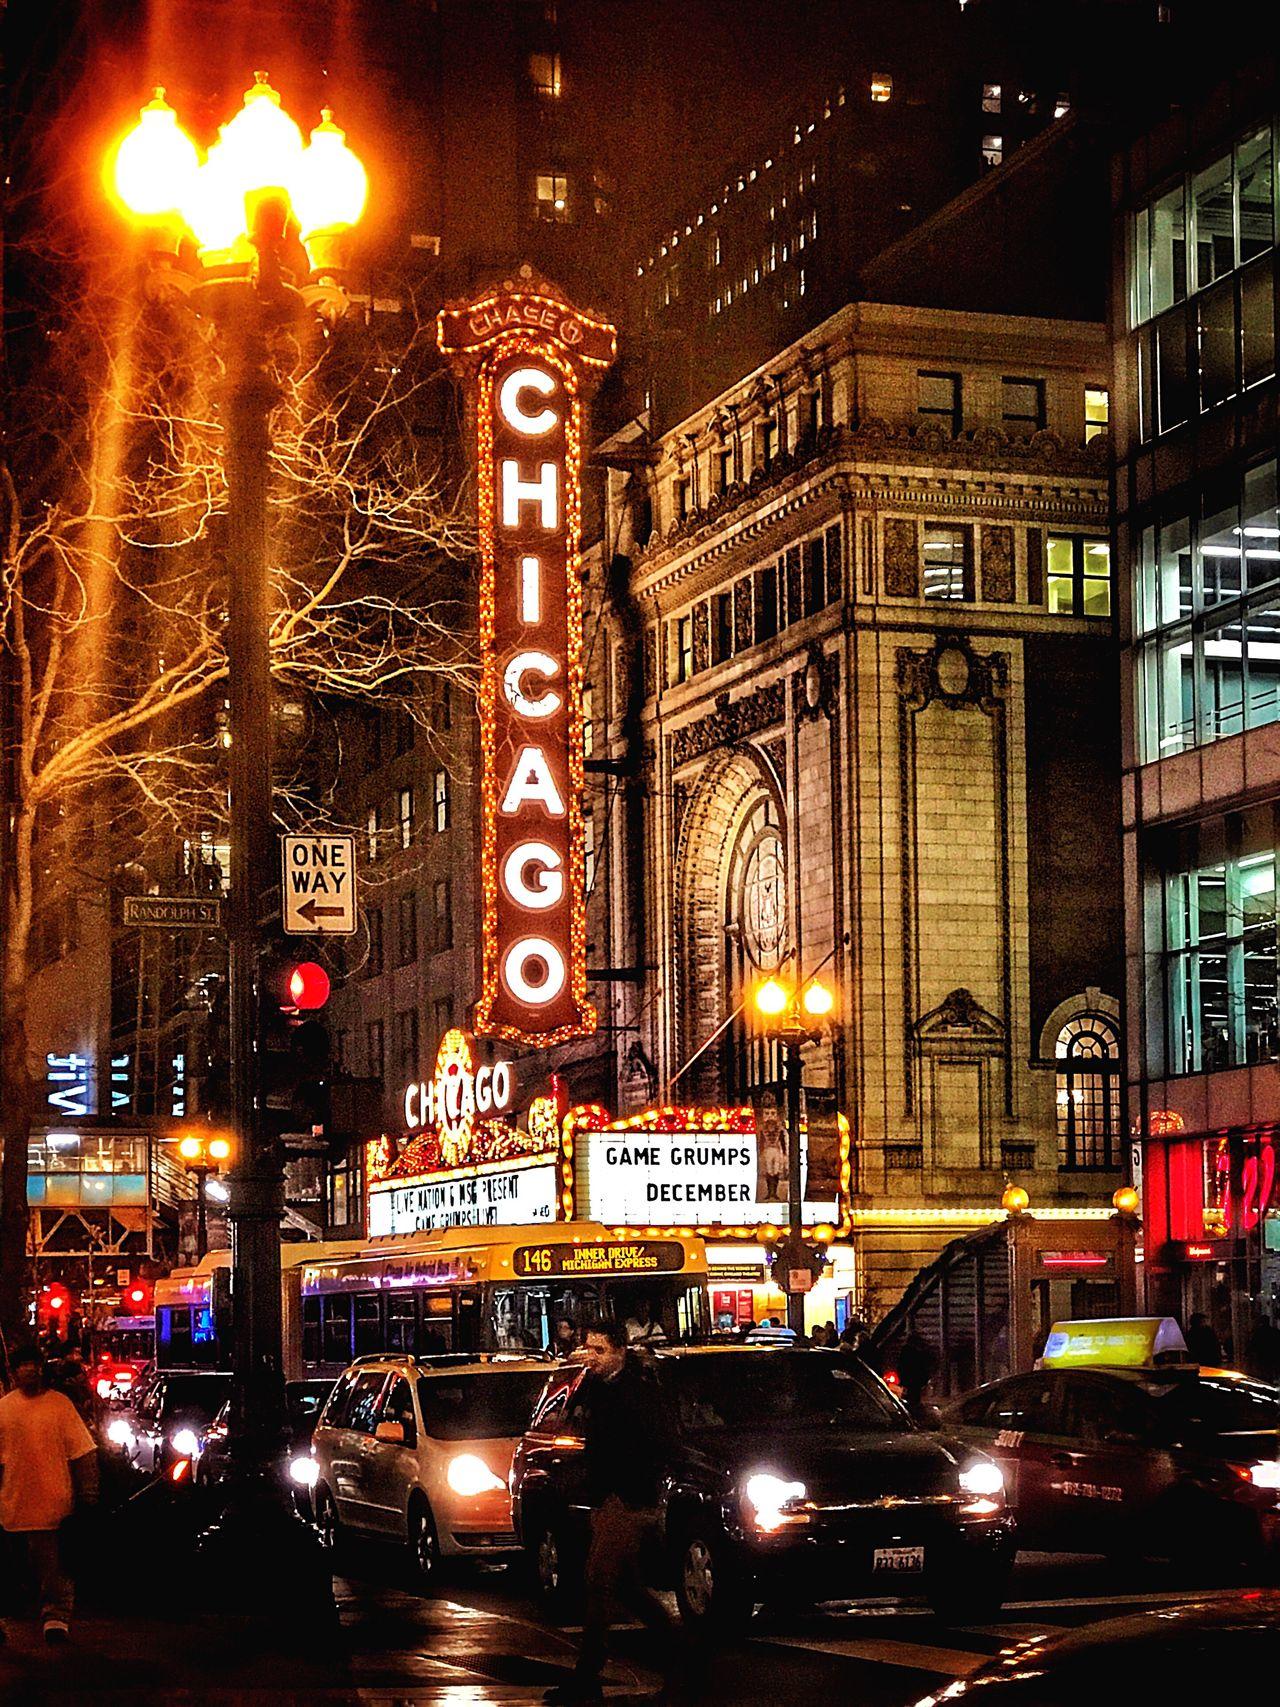 My favorite Marquis Chicago Chicago Theatre Perfect Always Architecture Lights And Shadows Illuminated Night Nightphotography Night Lights Iphone7+ Travel Visit MyCity❤️ EyeEm EyeEm Best Shots EyeEm Gallery EyeEmBestPics